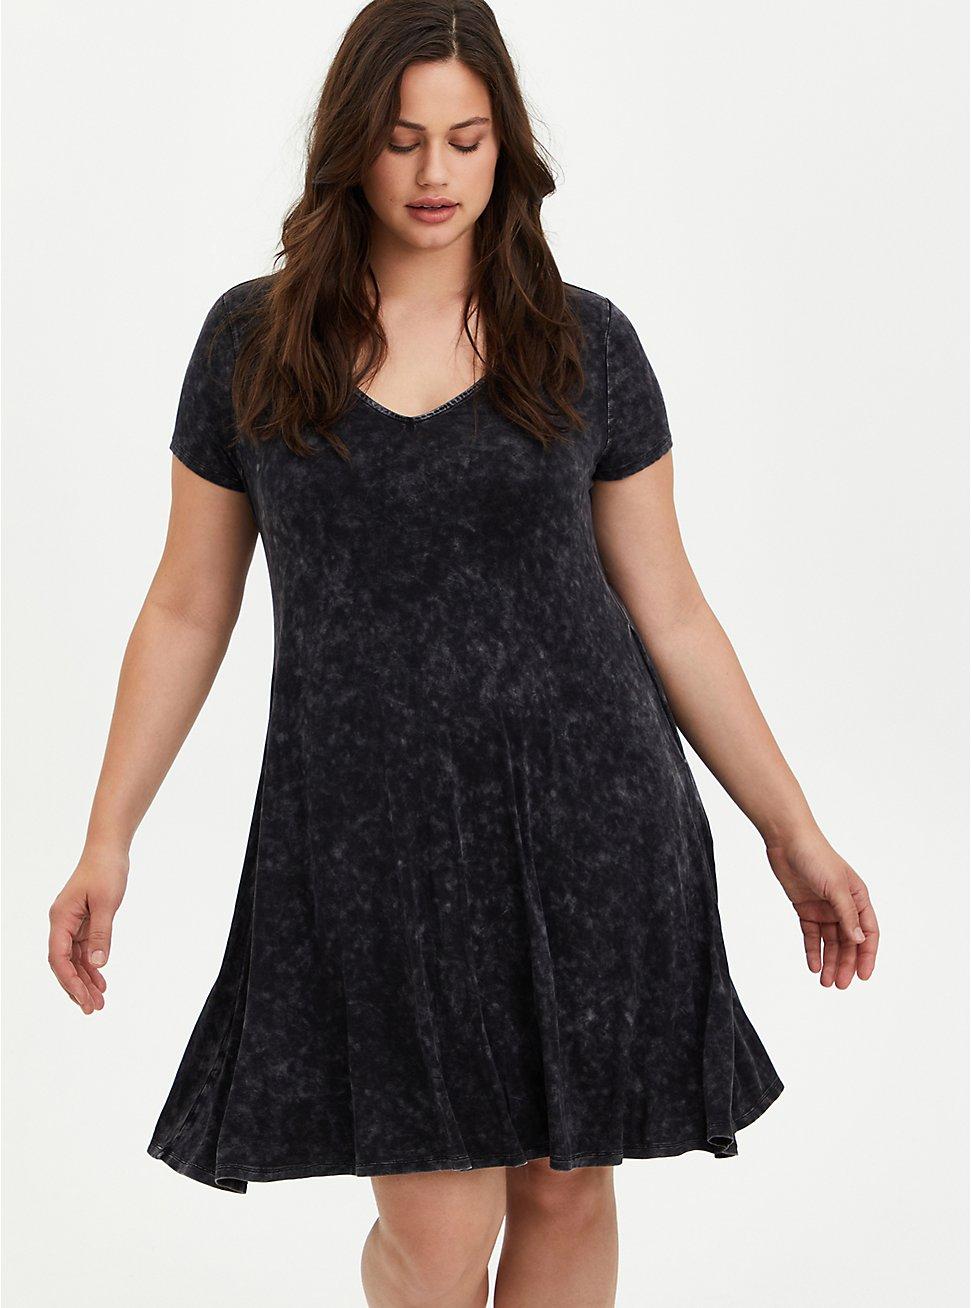 Fluted Mini Dress - Super Soft Black Wash, TIE DYE-BLACK, hi-res